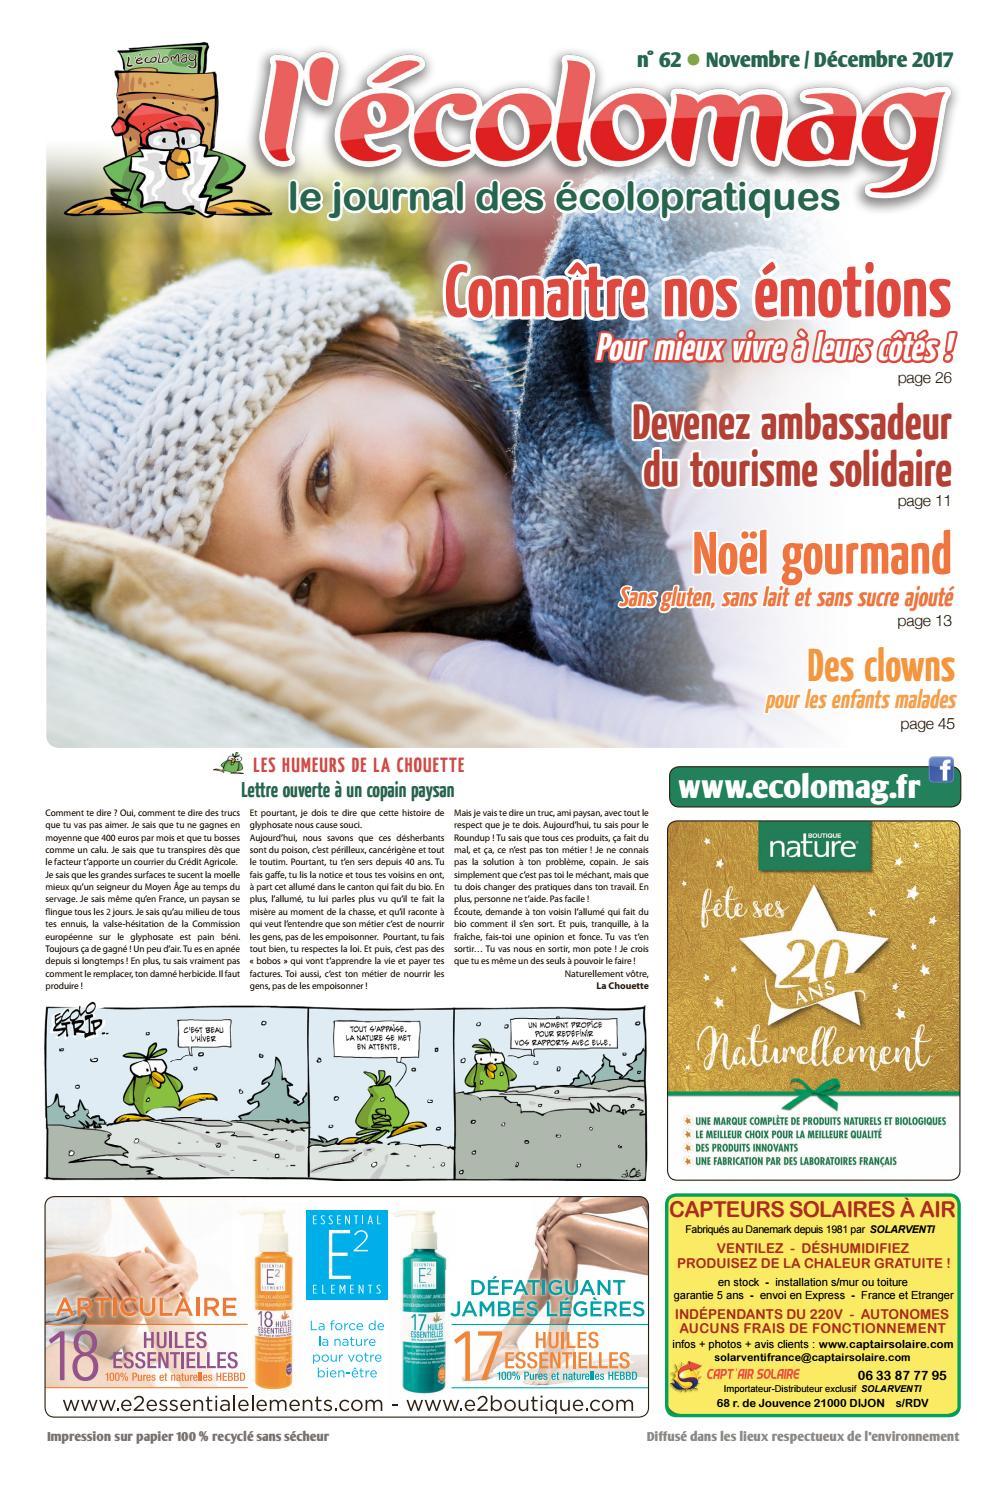 L Ecolomag n°62 by L Ecolomag - issuu 0b82461bd8e3